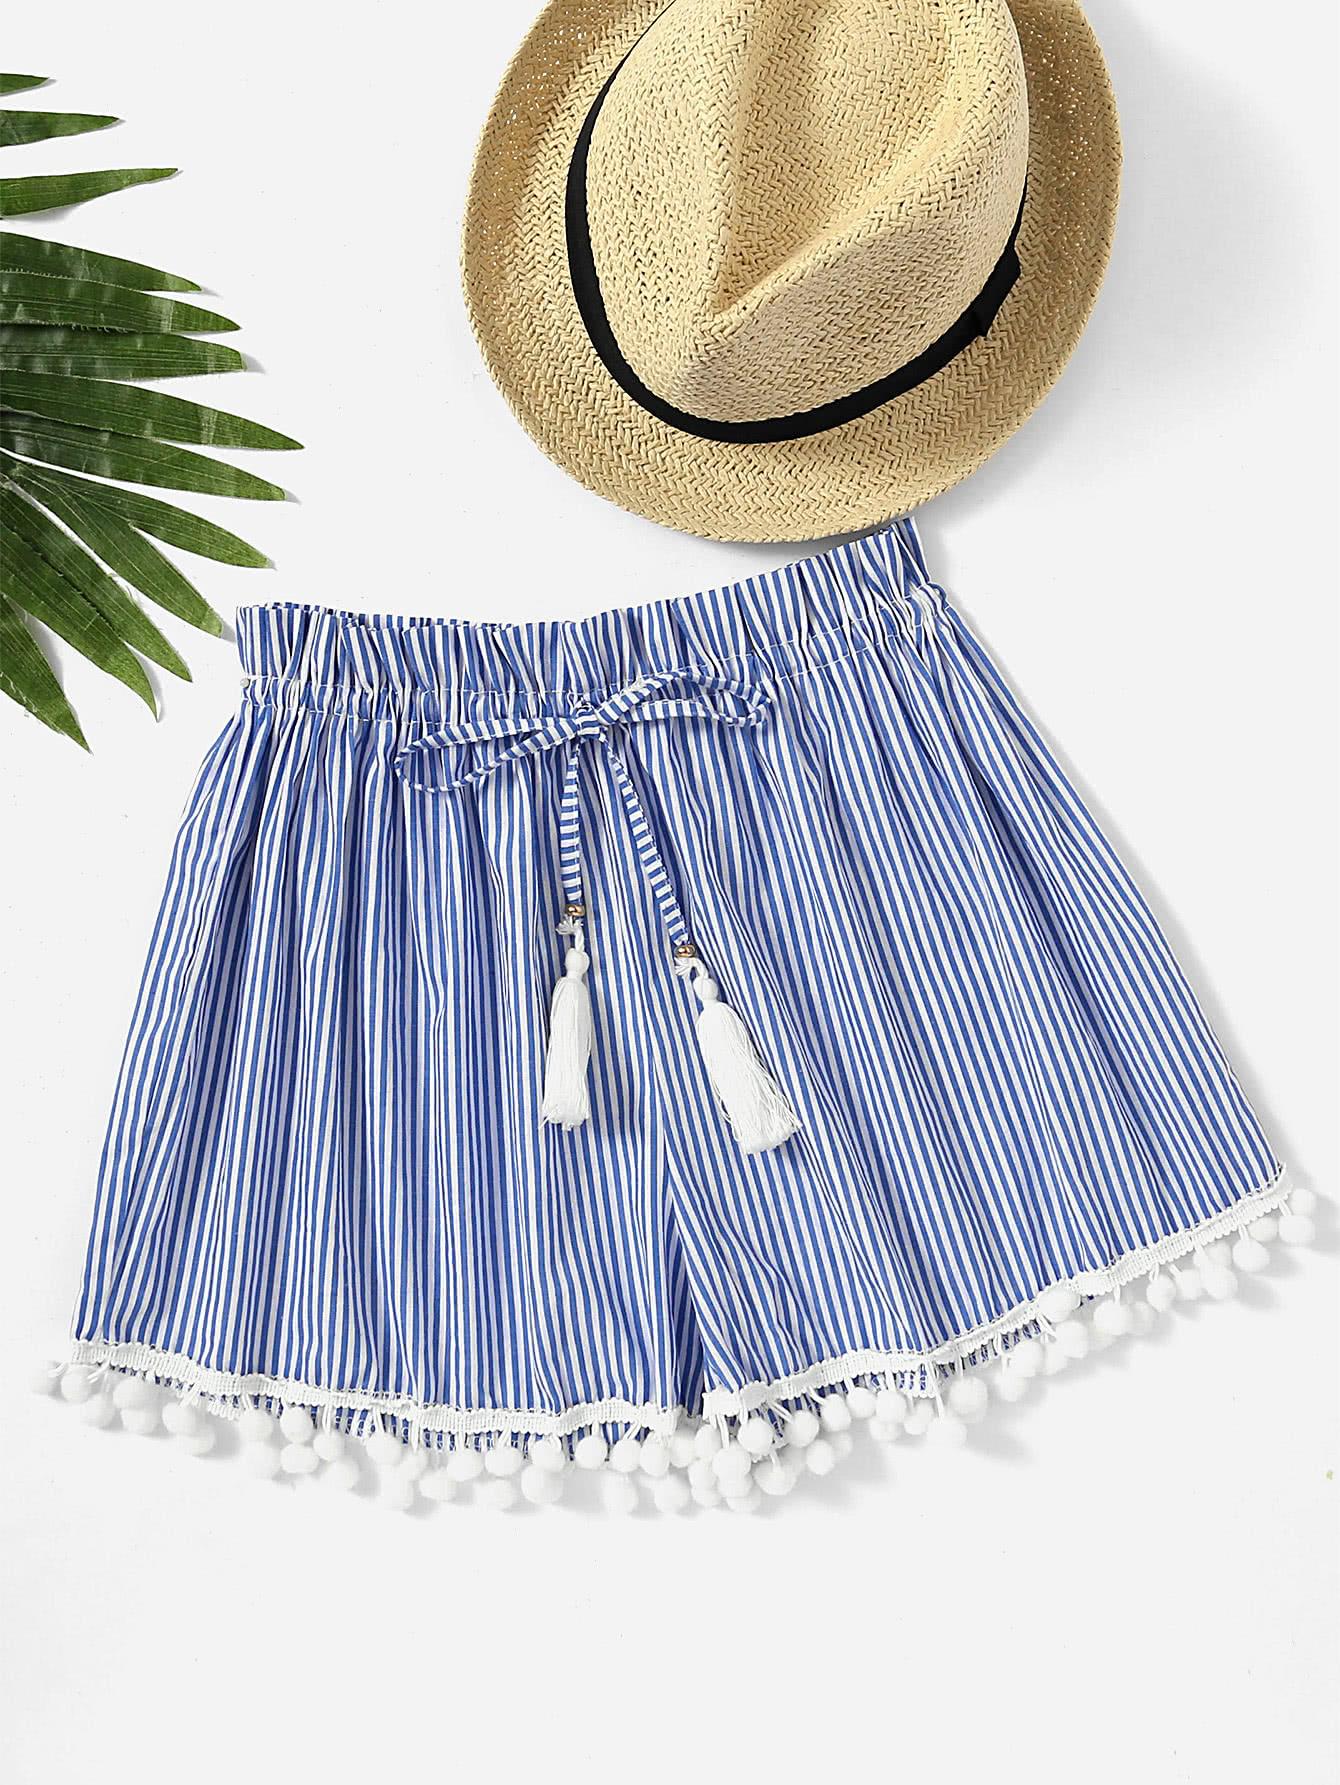 Vertical Striped Drawstring Waist Pompom Hem Shorts sweet wavy hem design striped shorts for women